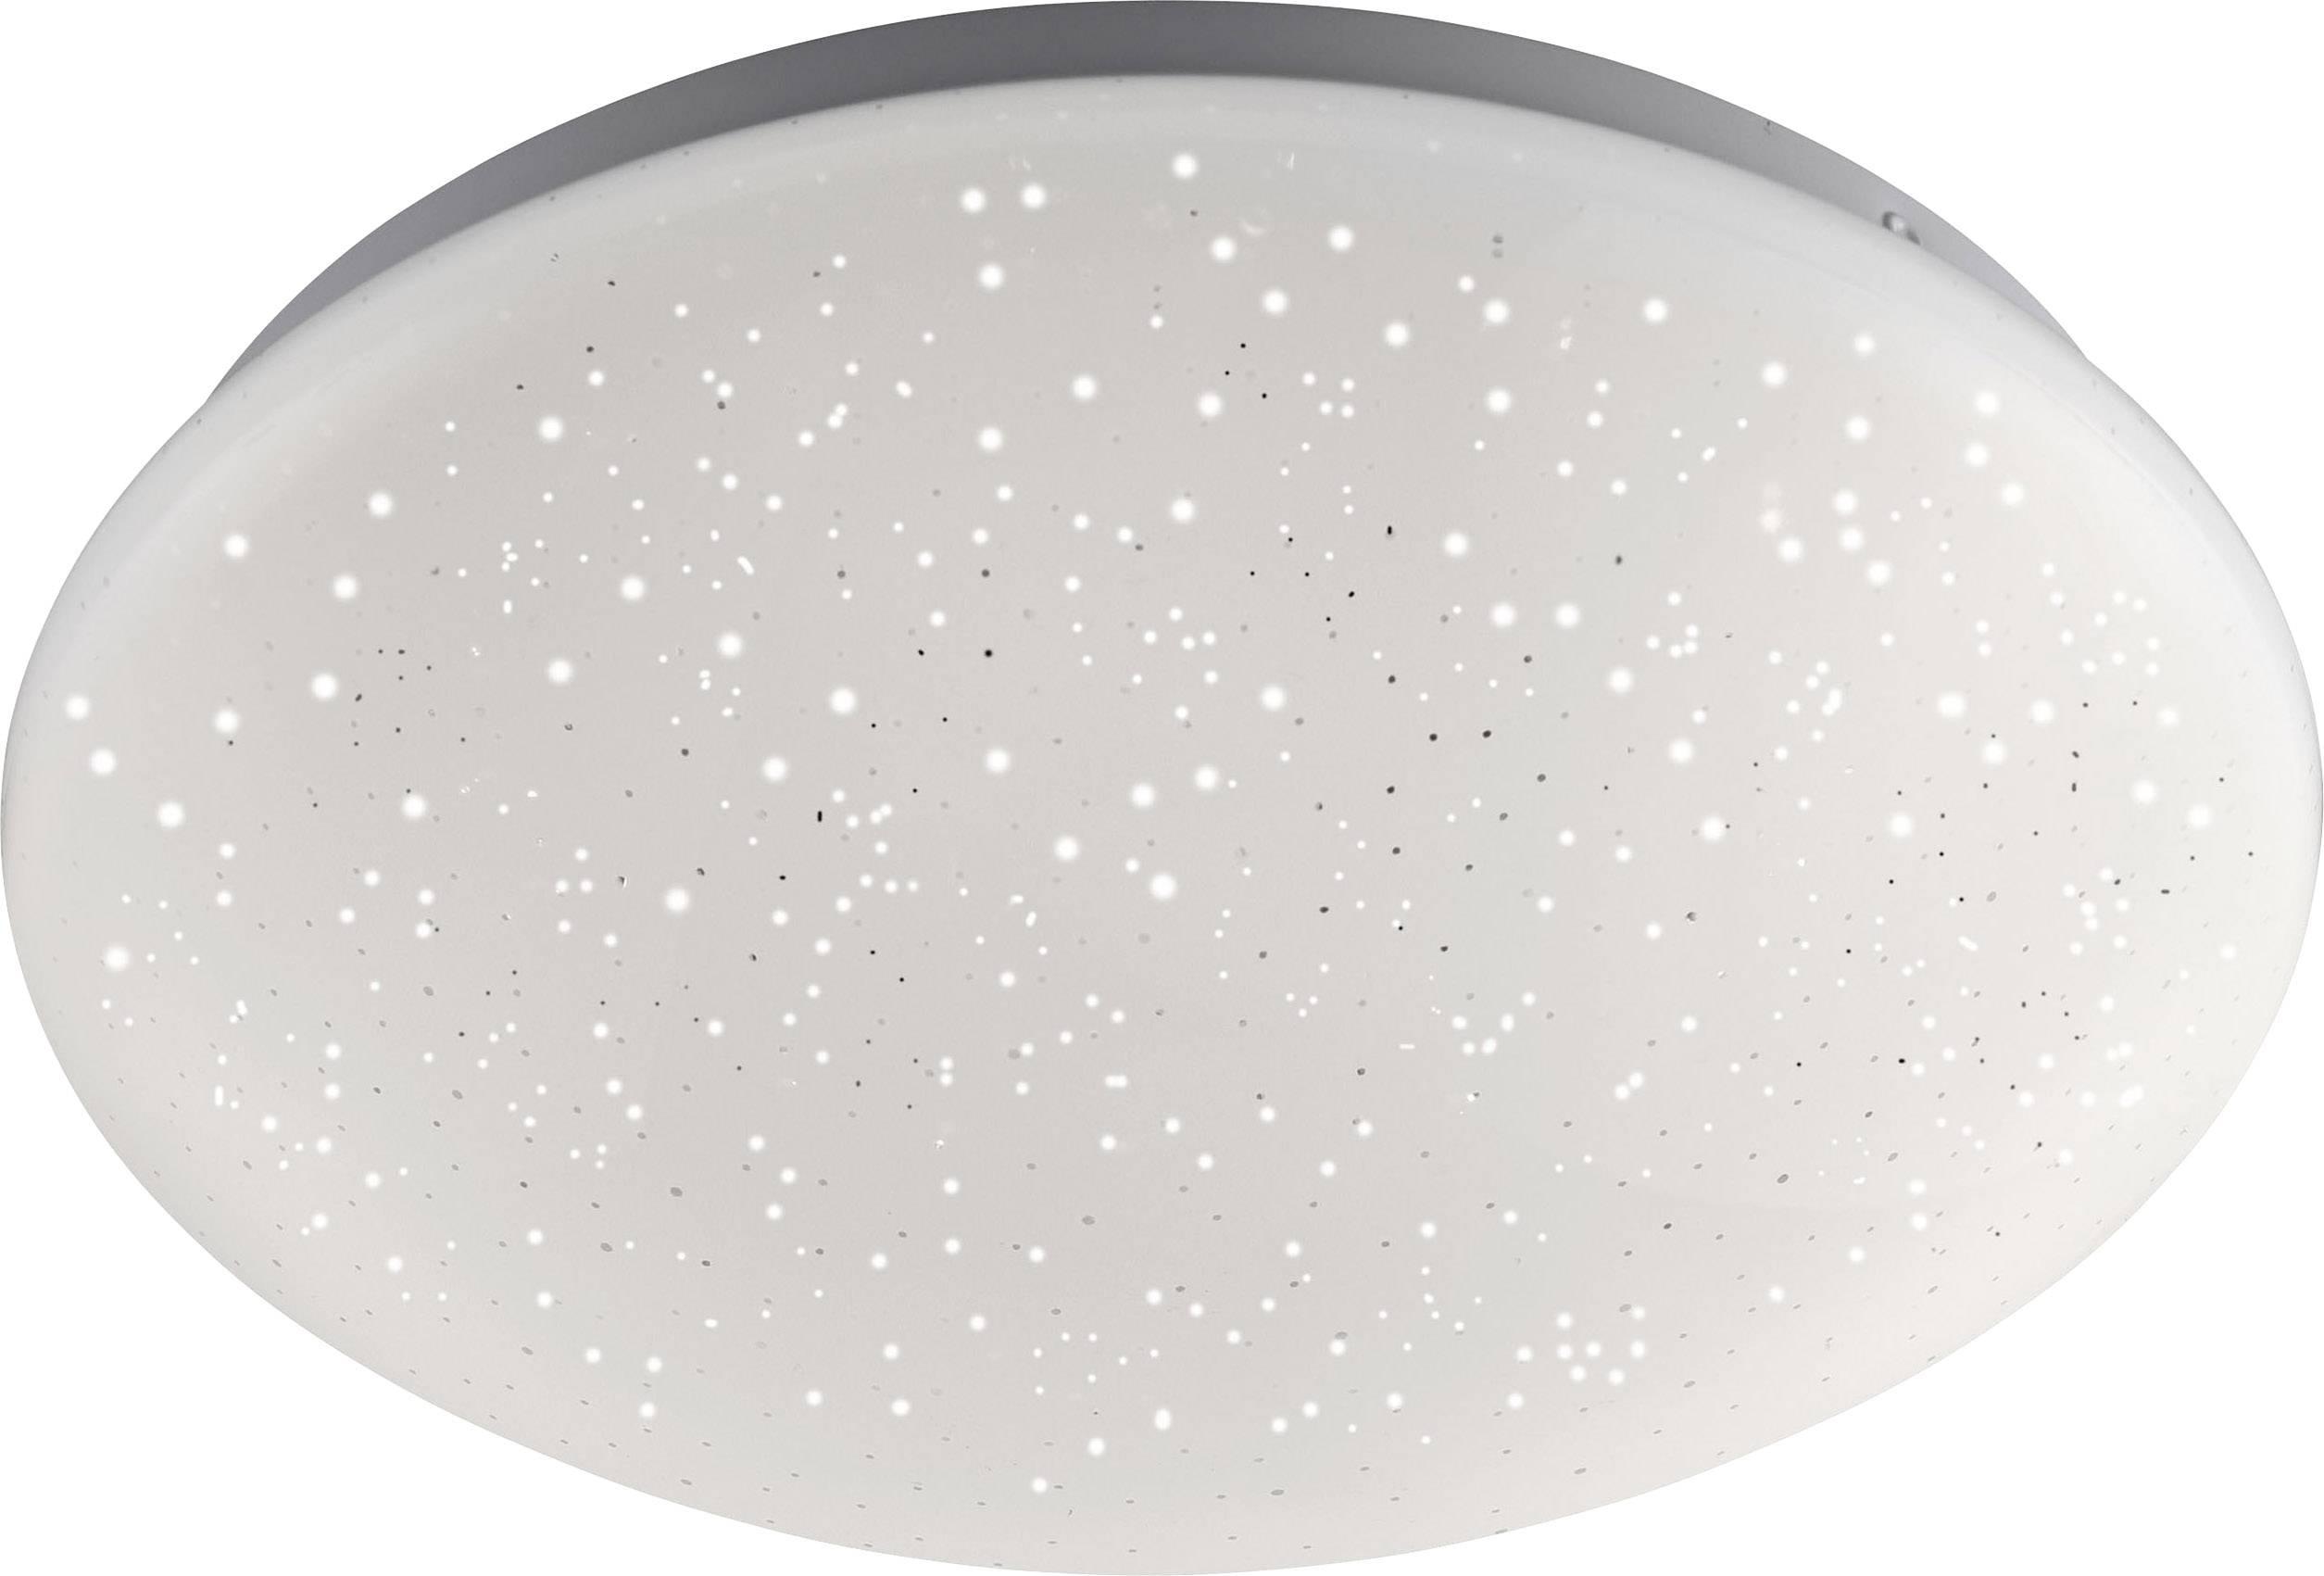 Plafoniere Rgb : Leuchtendirekt skyler plafoniera led w rgb bianco caldo